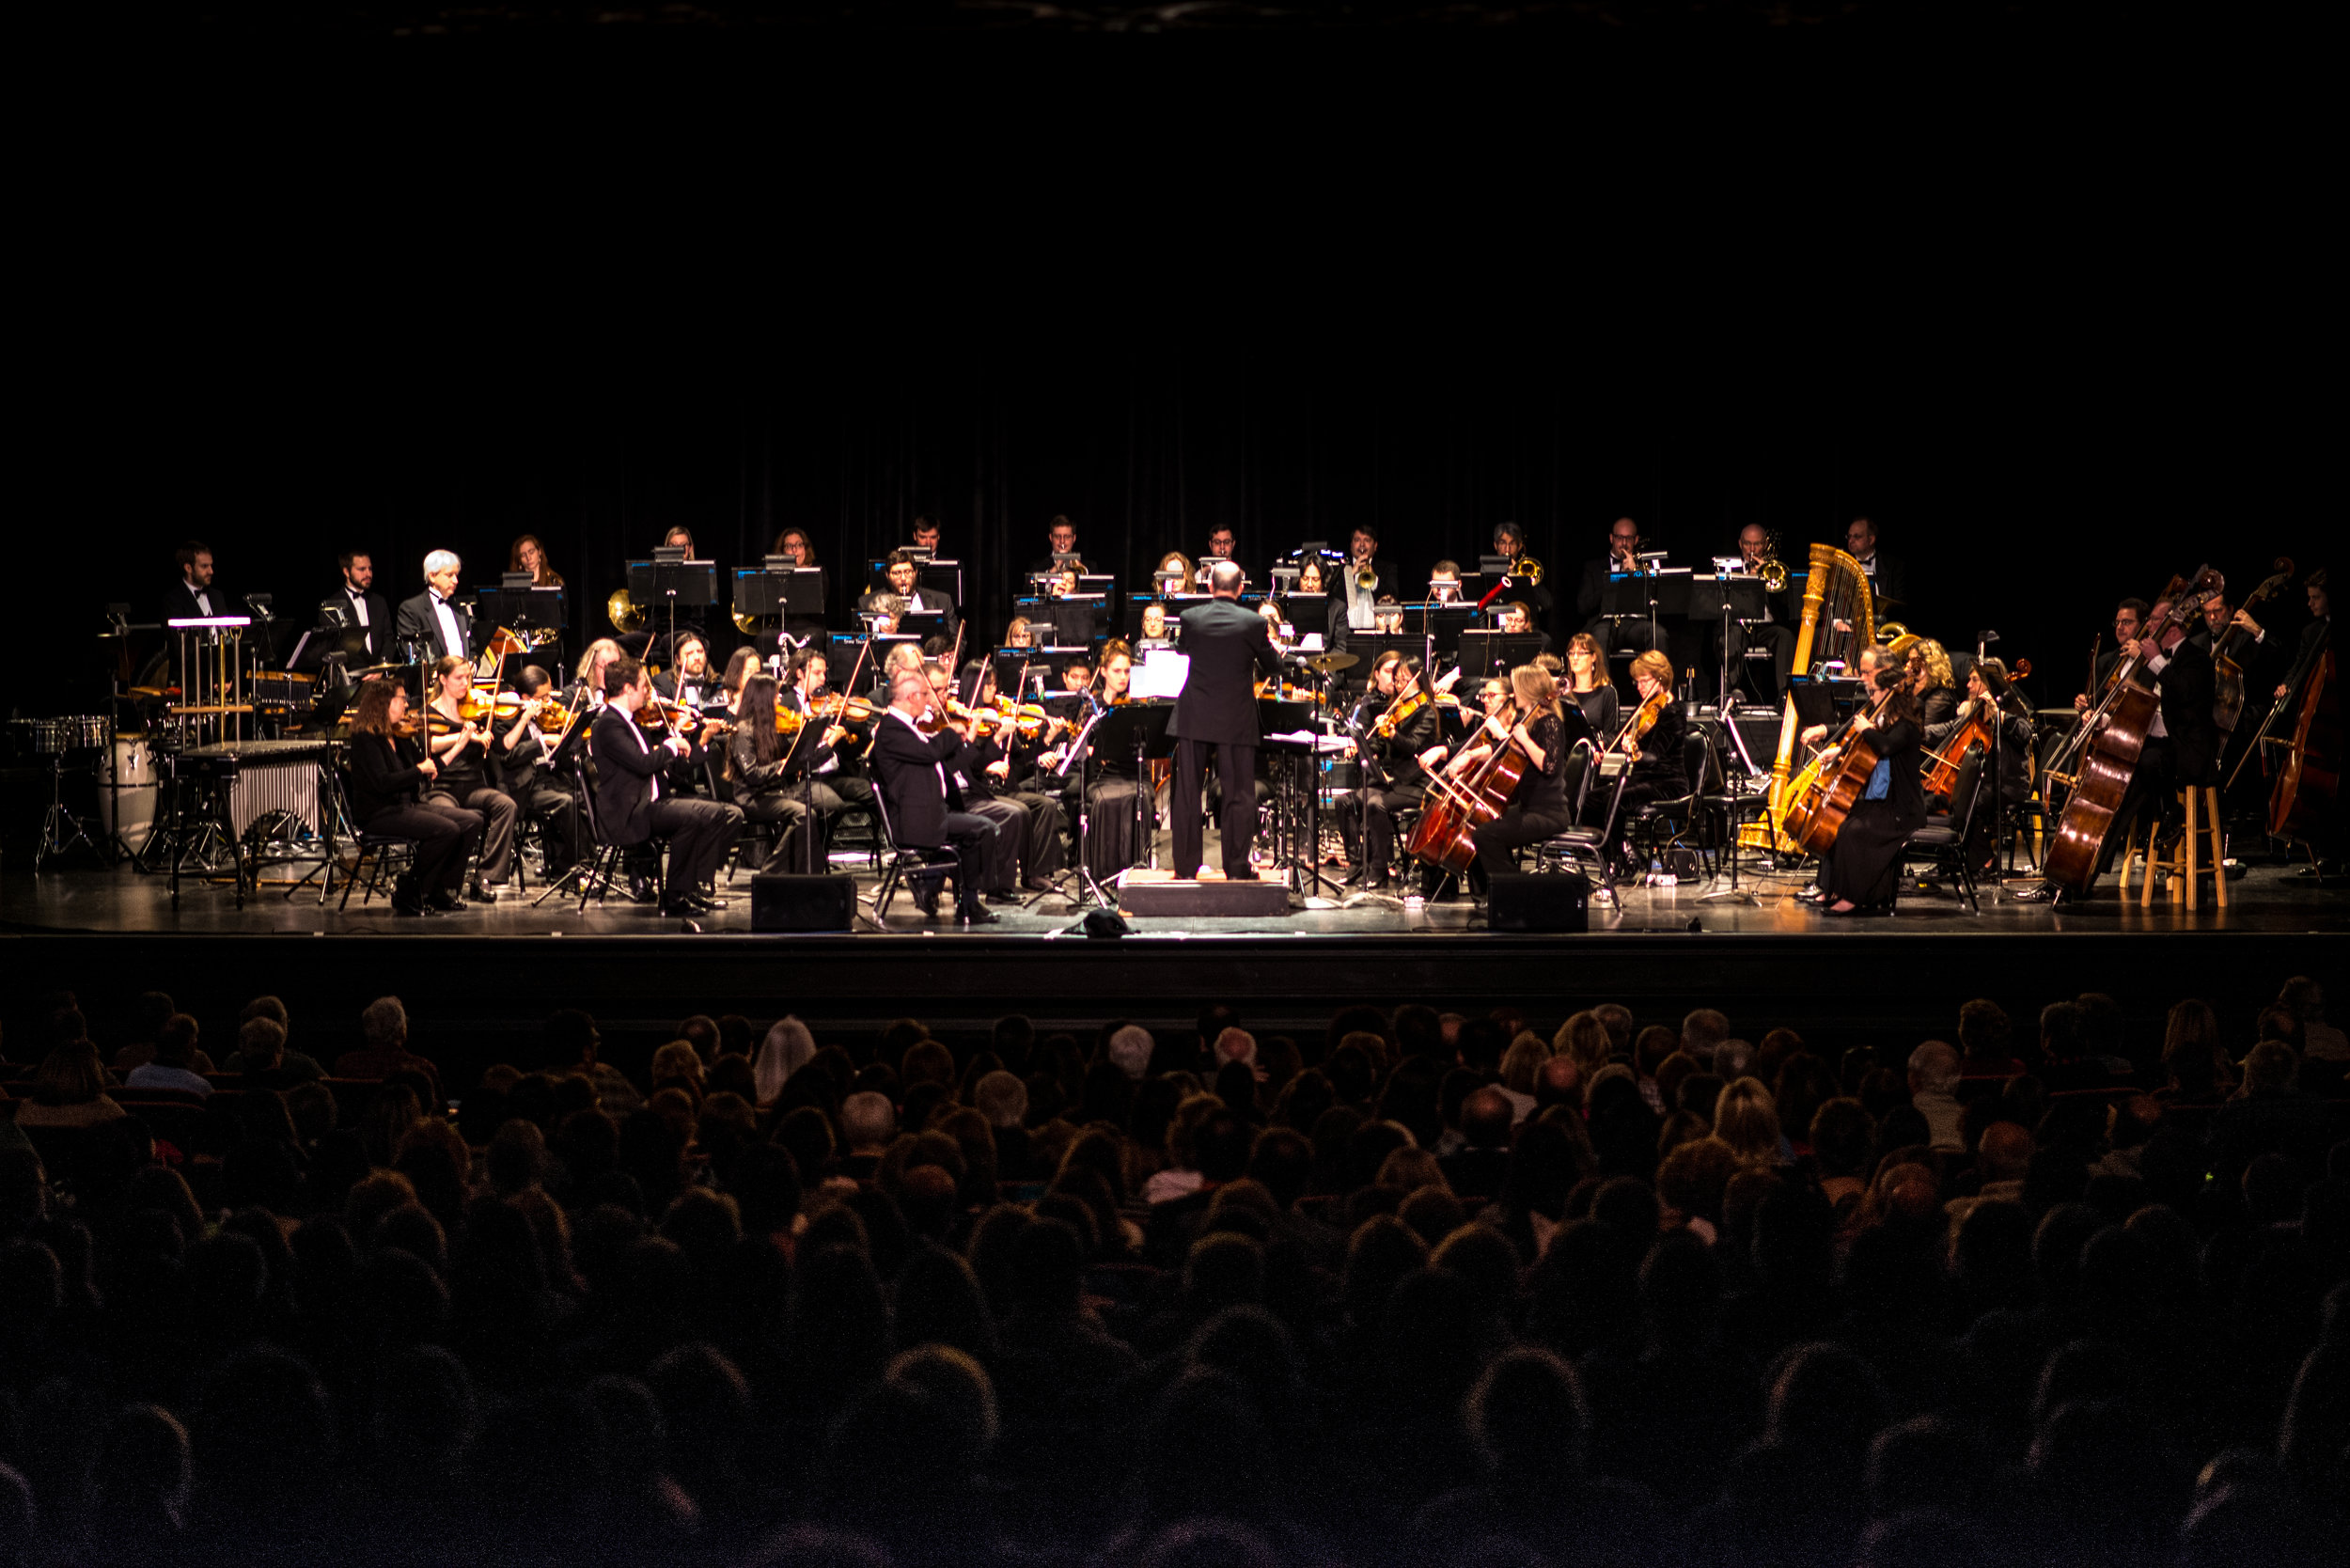 Pennsylvania Philharmonic Orchestra